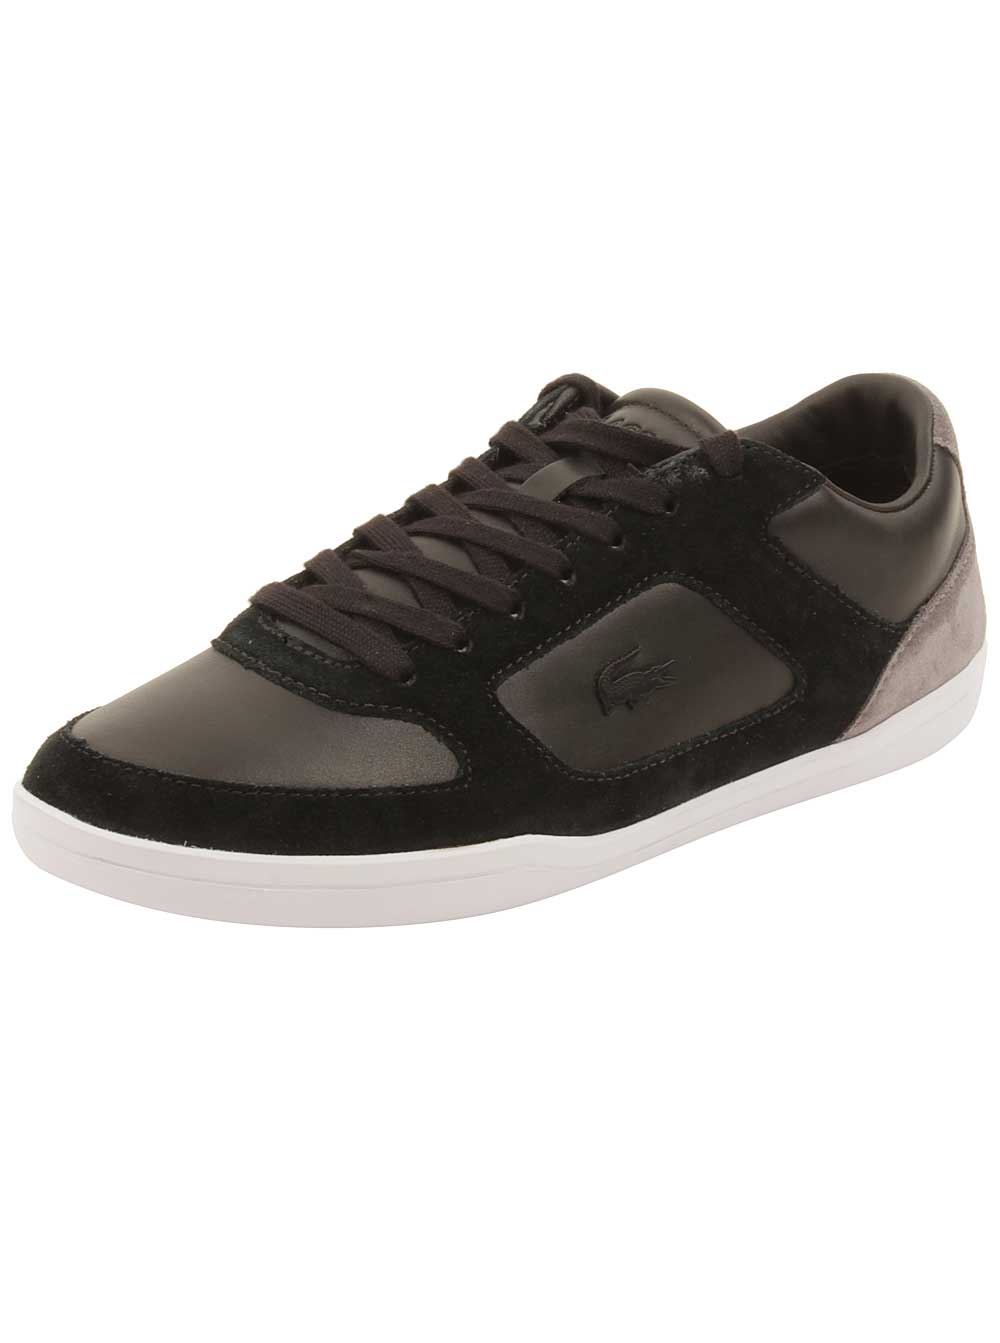 Lacoste Mens Court-Minimal 316 Sneakers in Black